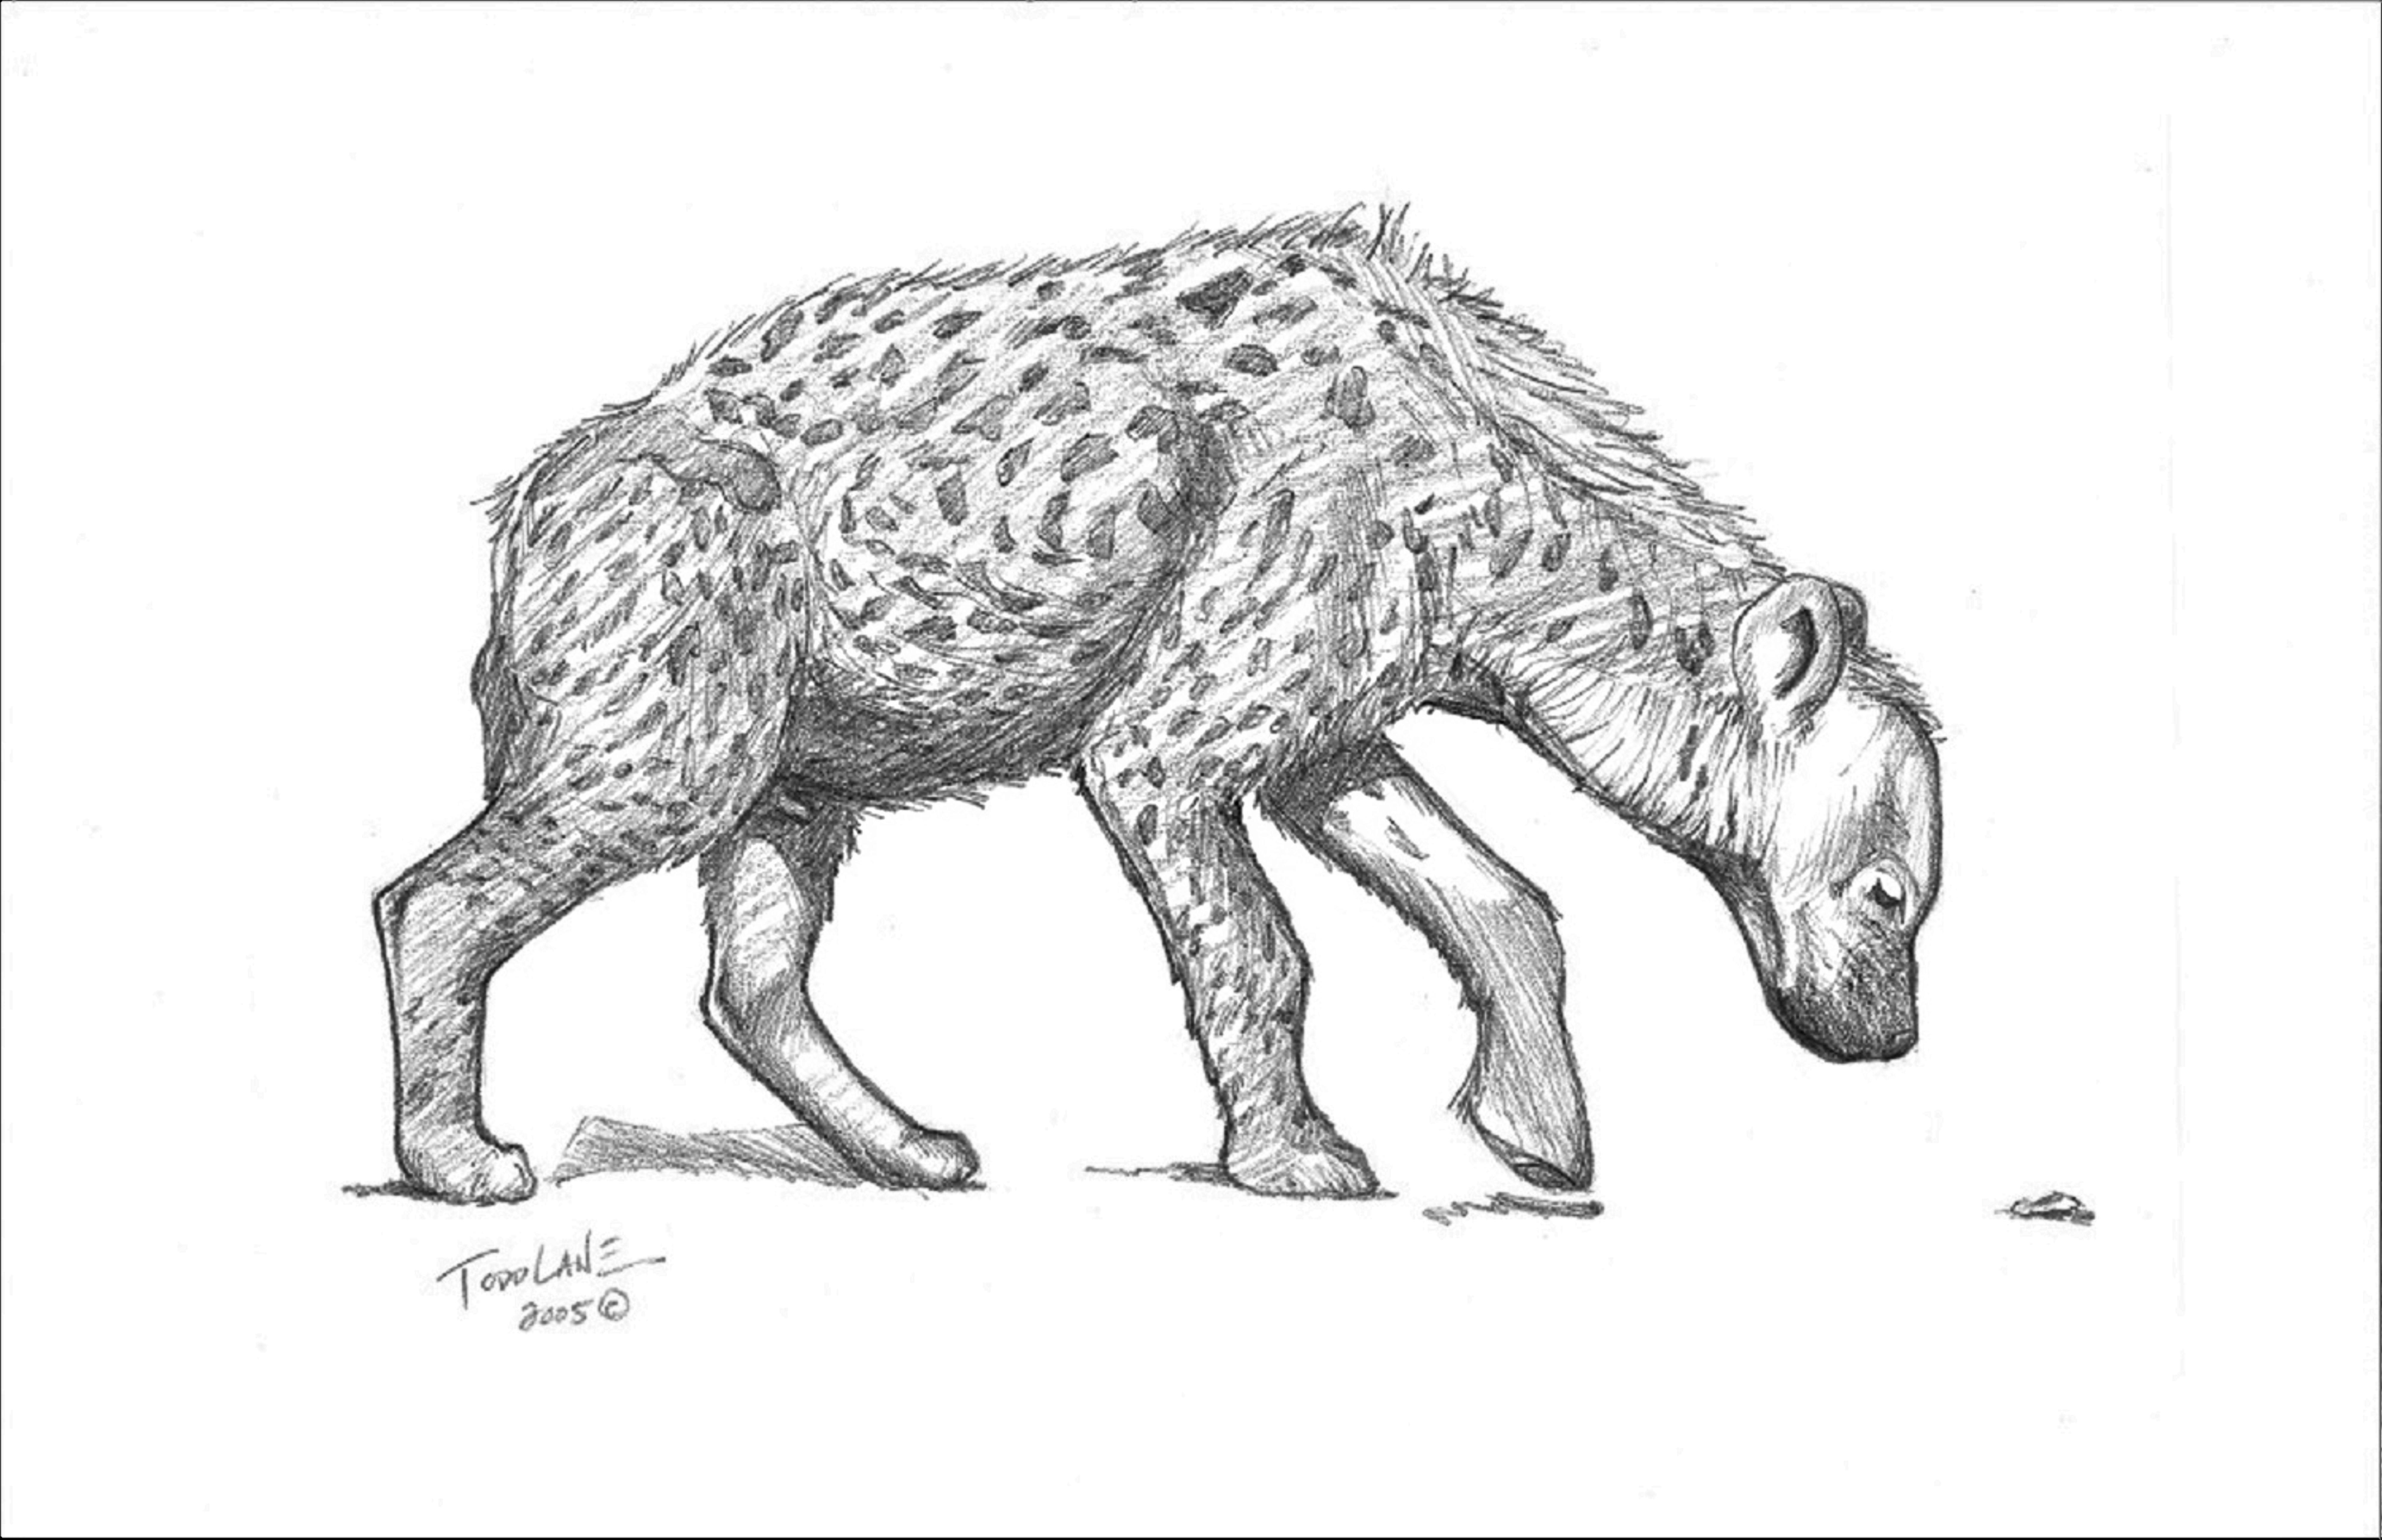 The Investigator Kenya Series Image 4 artwork by Todd Lane - art listed for sale on Artplode